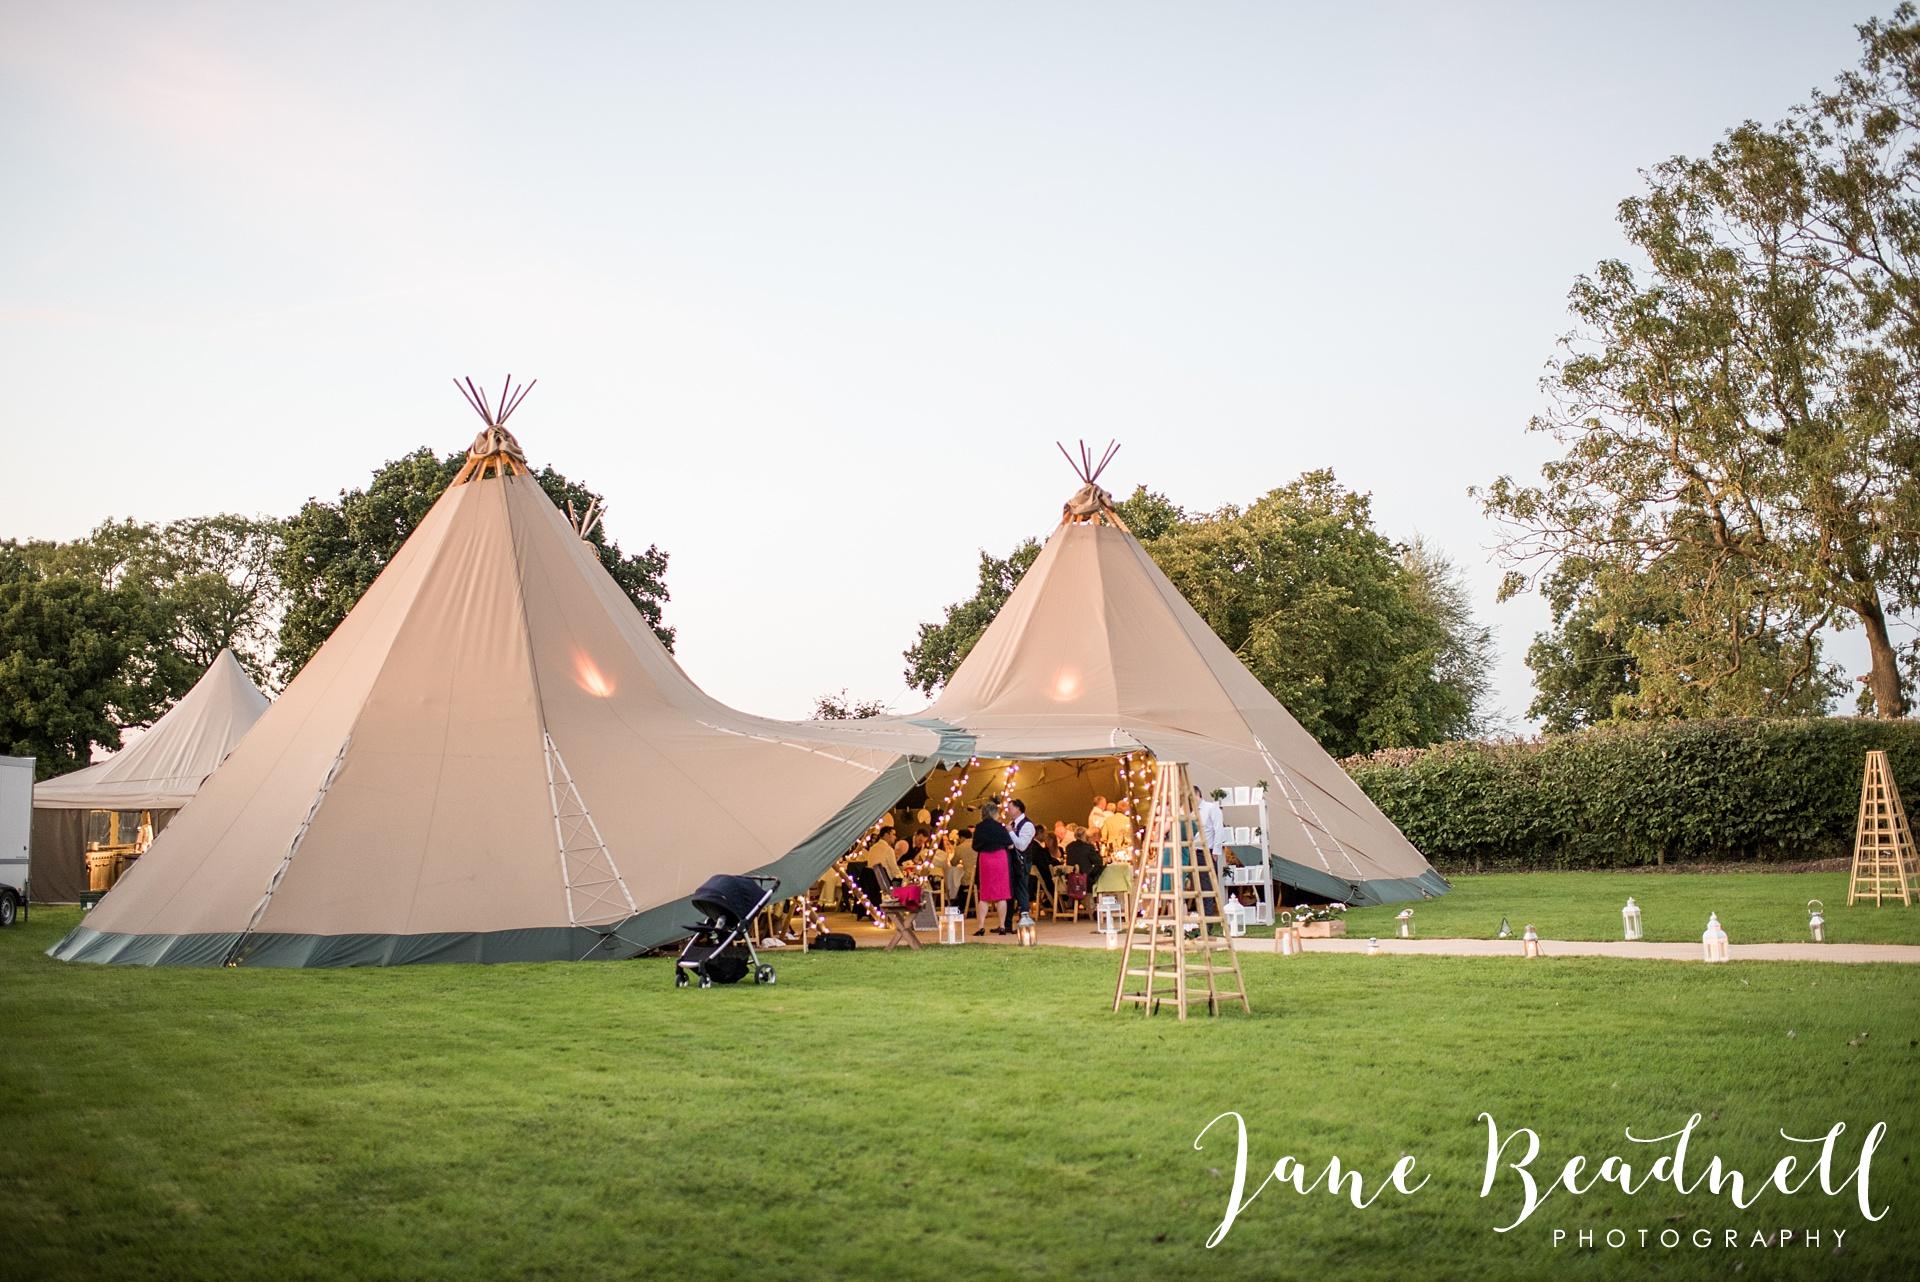 fine-art-wedding-photographer-jane-beadnell-yorkshire-wedding-photographer_0148